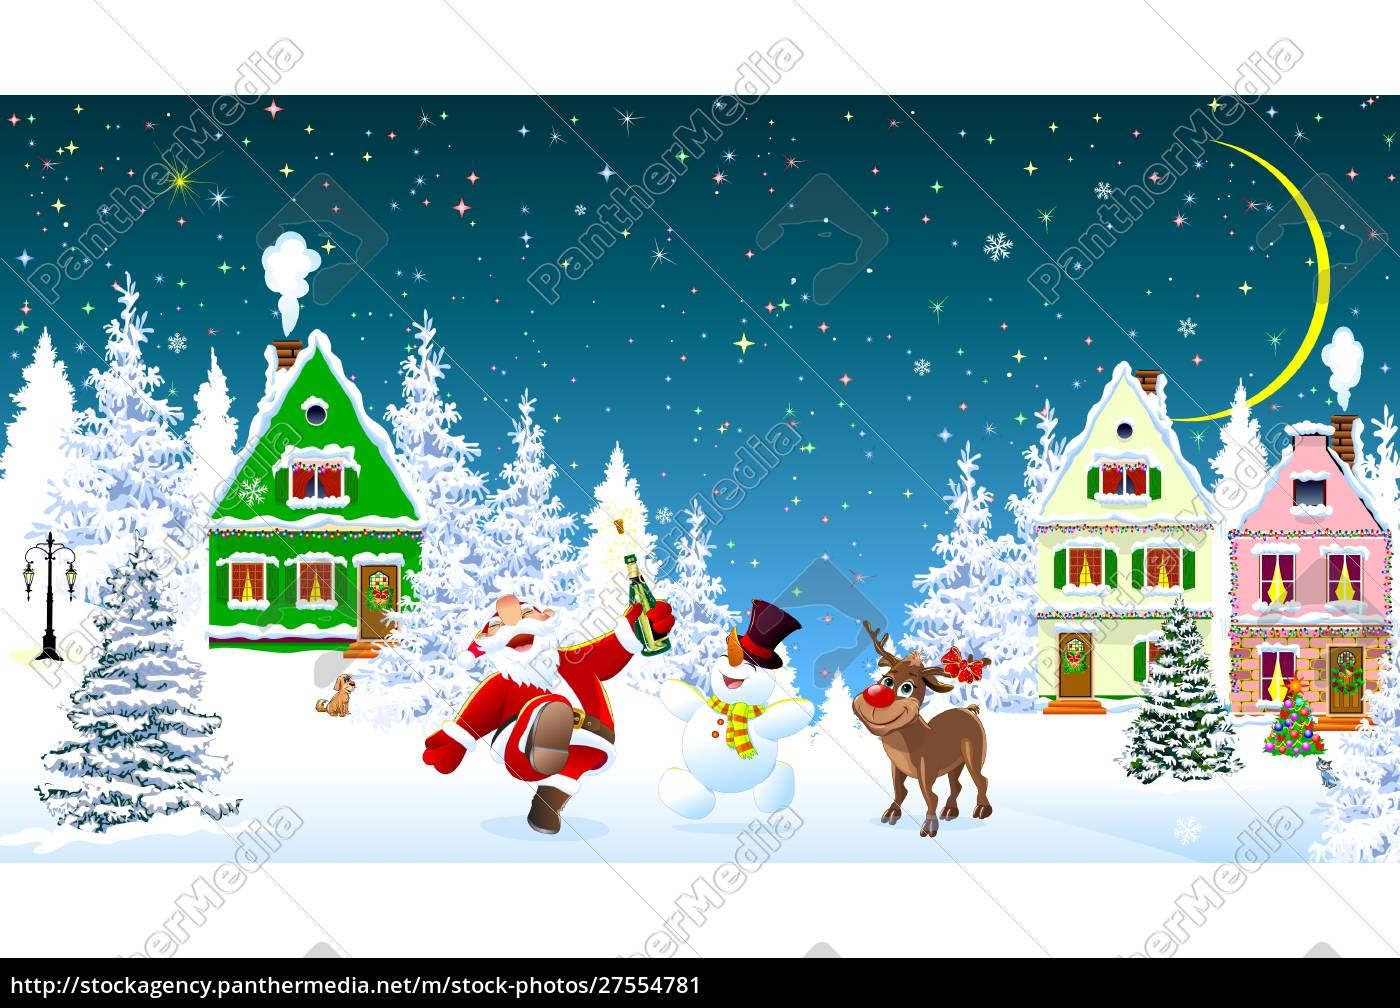 santa, claus, snowman, deer, celebrate, christmas - 27554781